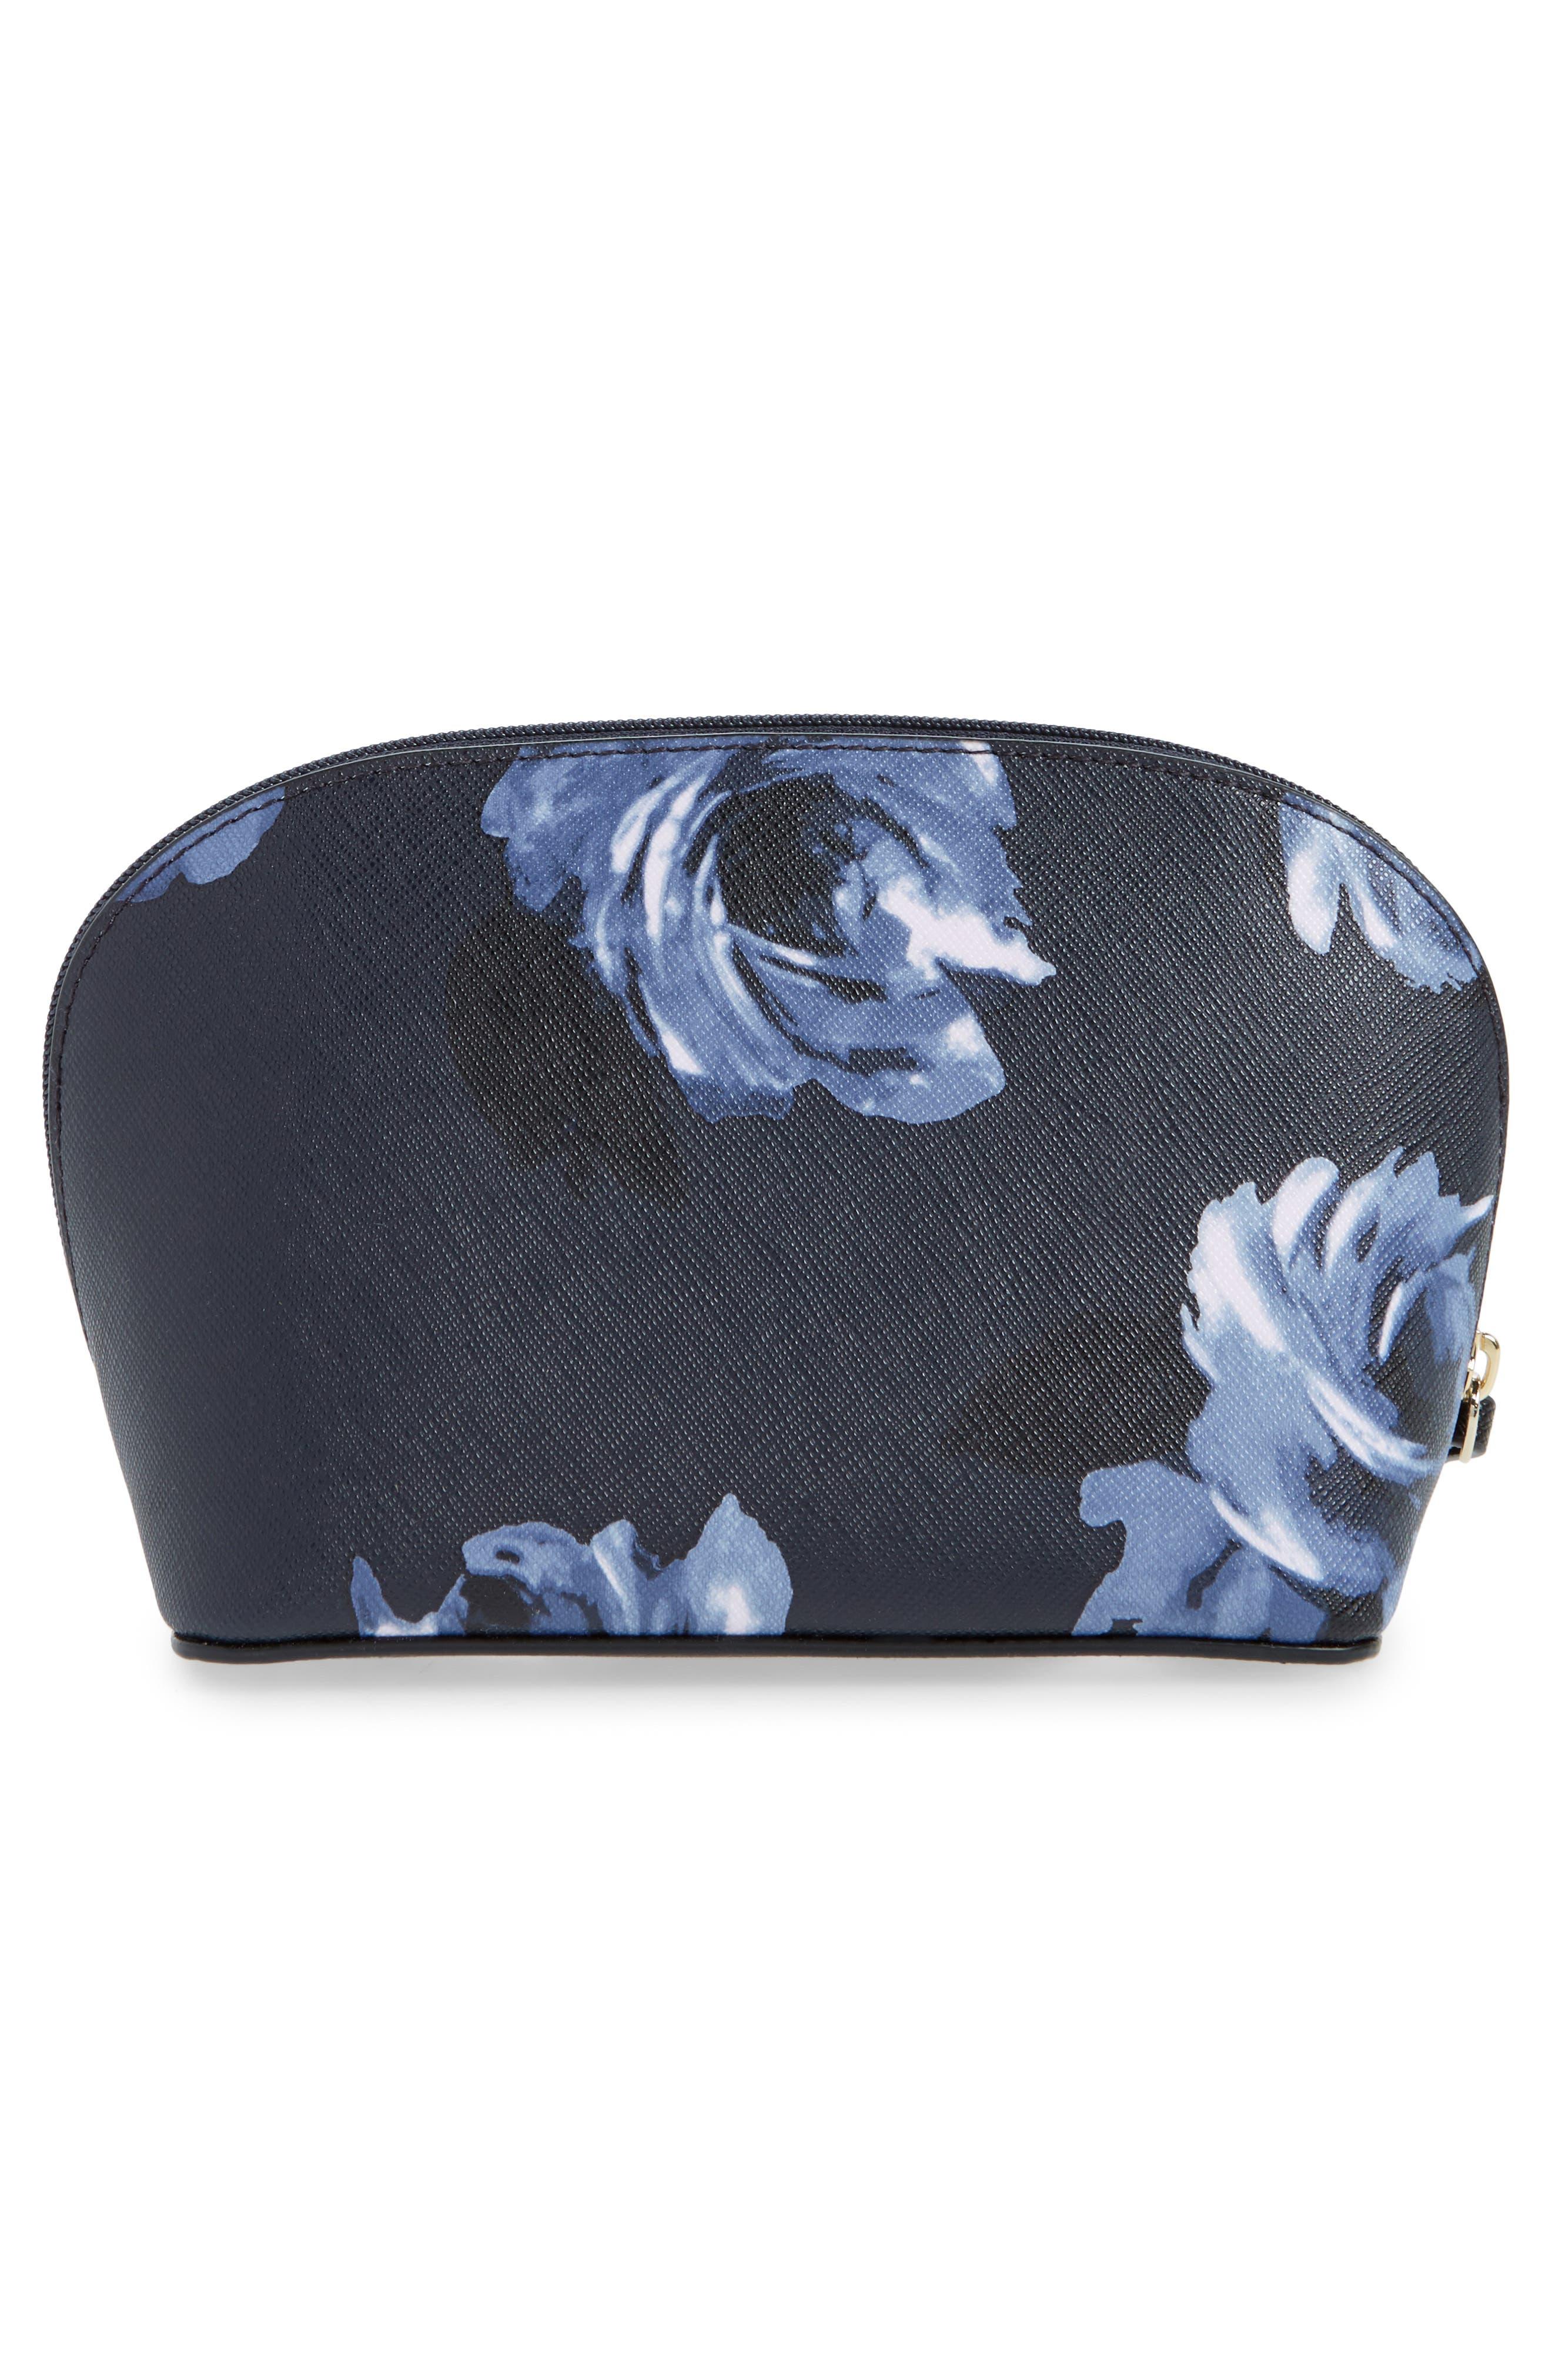 cameron street night rose - small abalene cosmetics bag,                             Alternate thumbnail 2, color,                             Rich Navy Multi